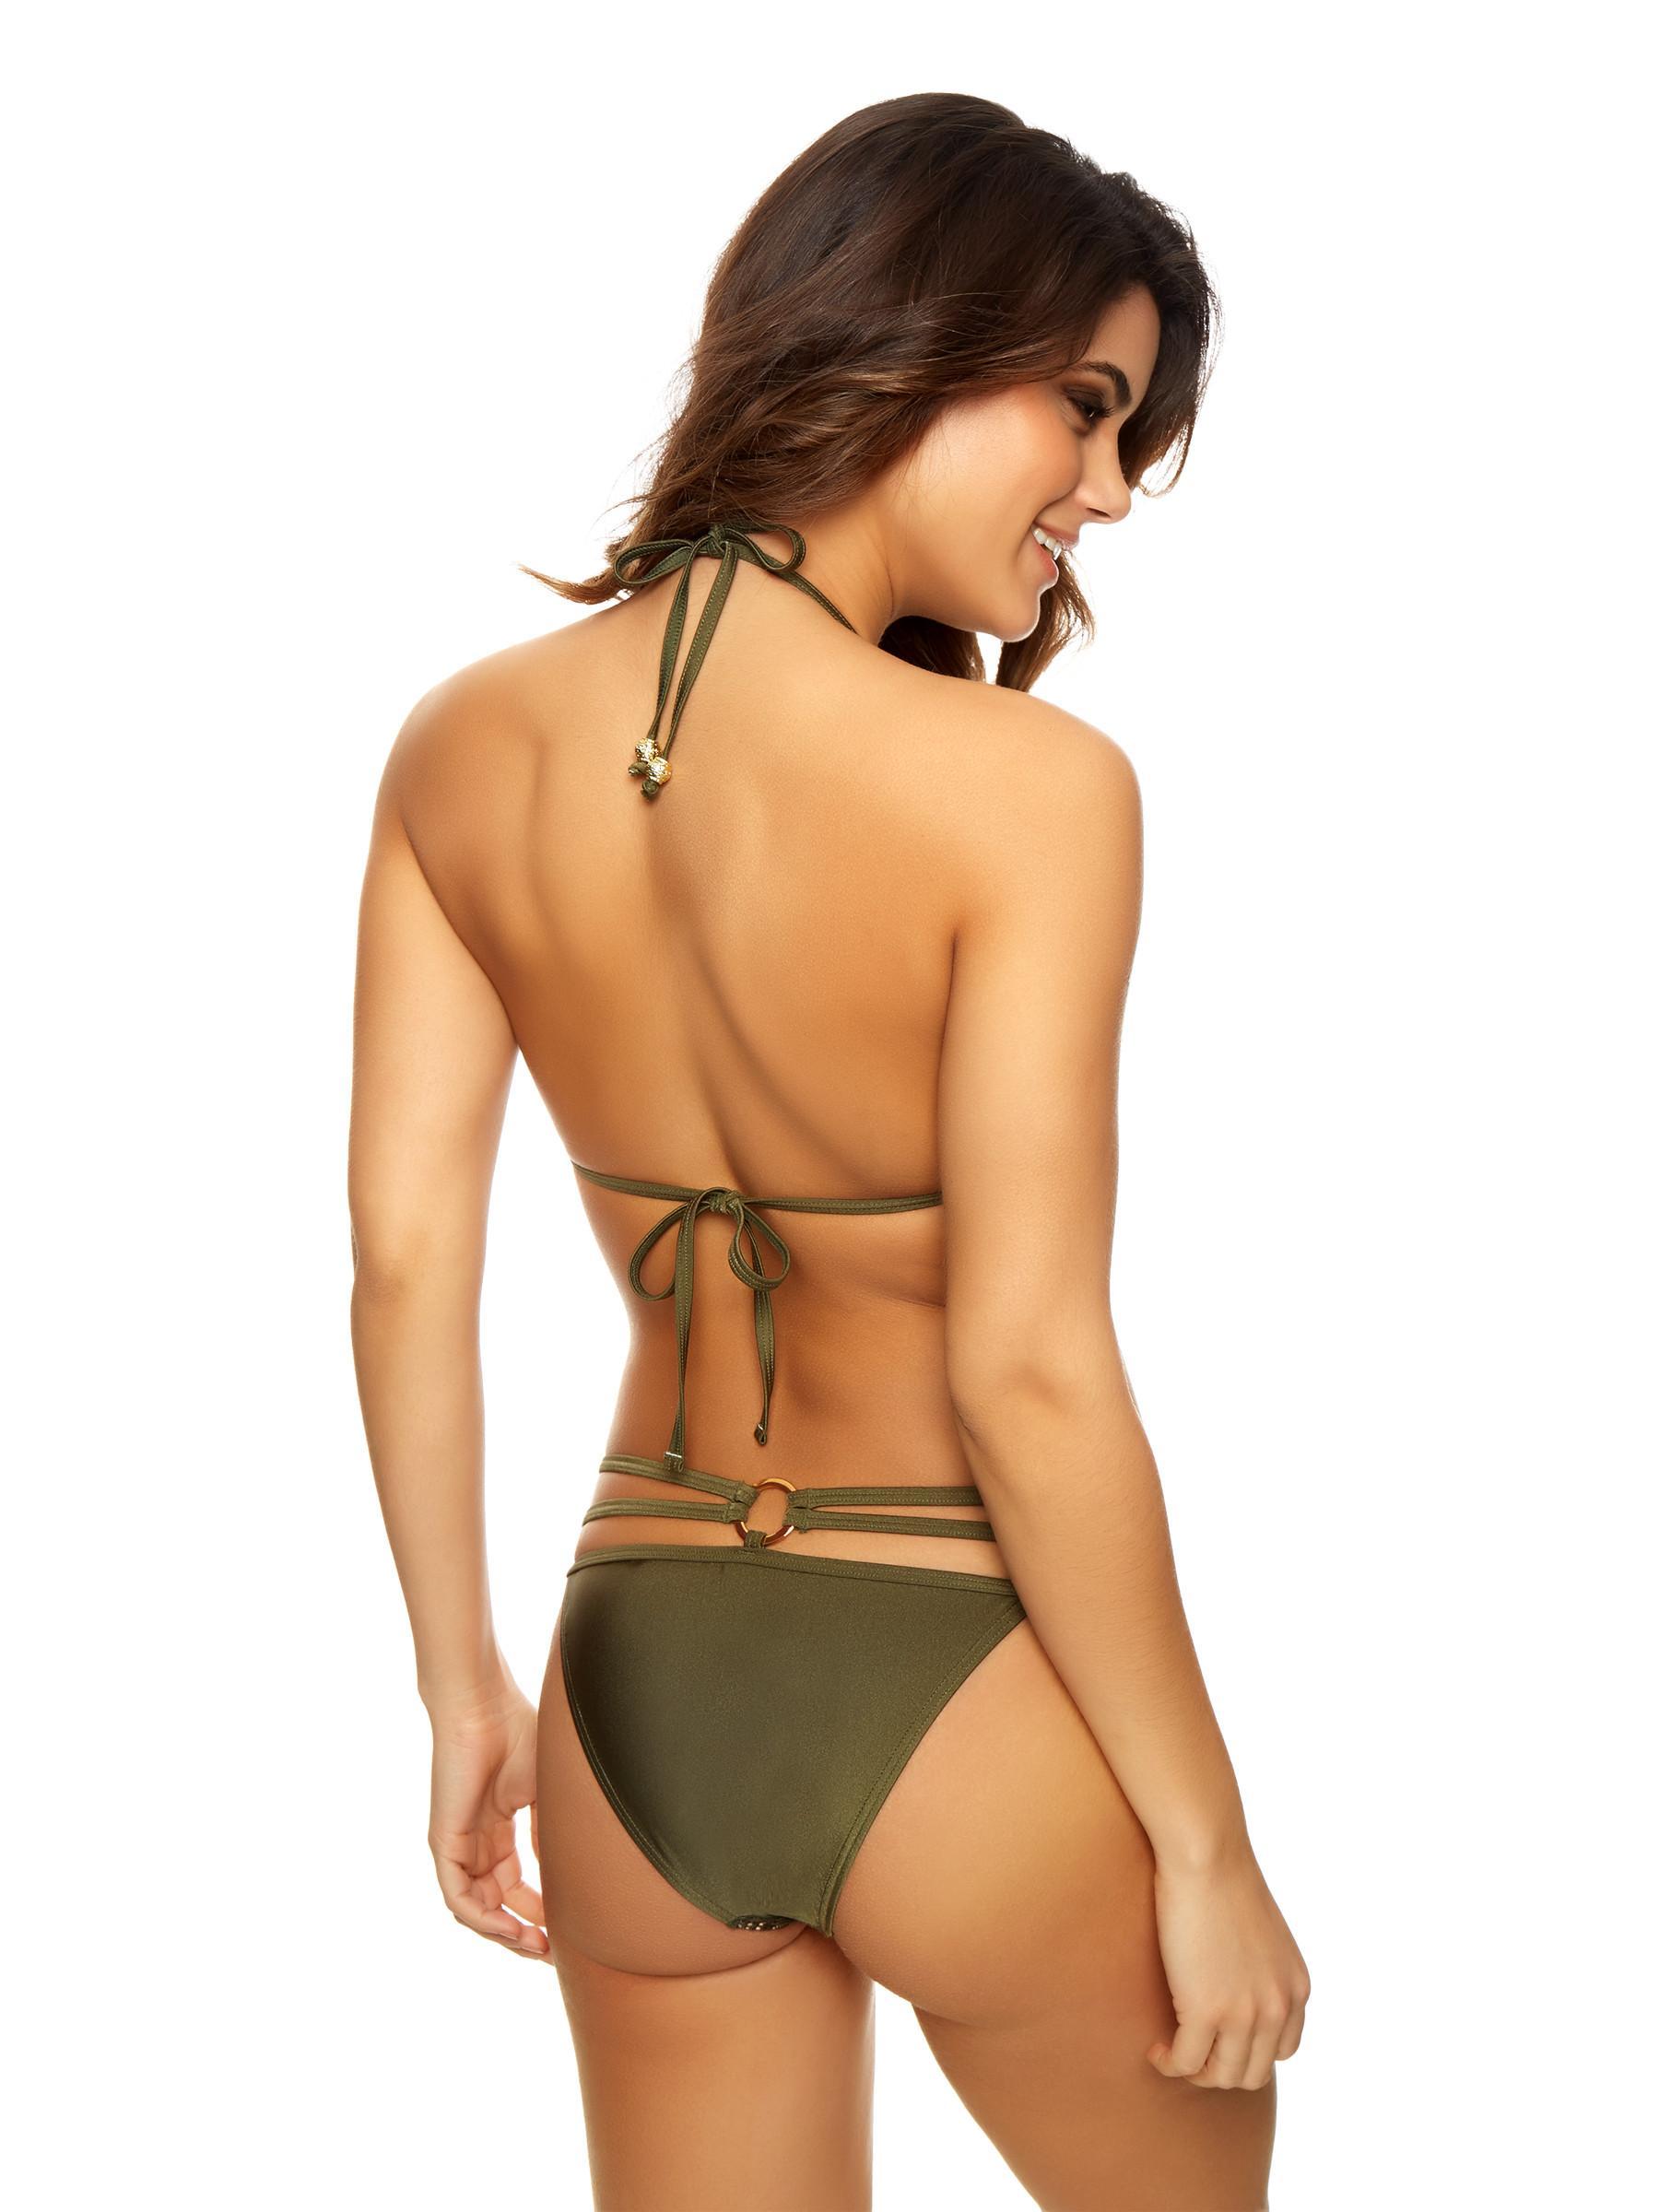 115f16d00127c Ann Summers Womens Ladies Mai Lace Bikini Lace Top Summer Swimwear Beachwear